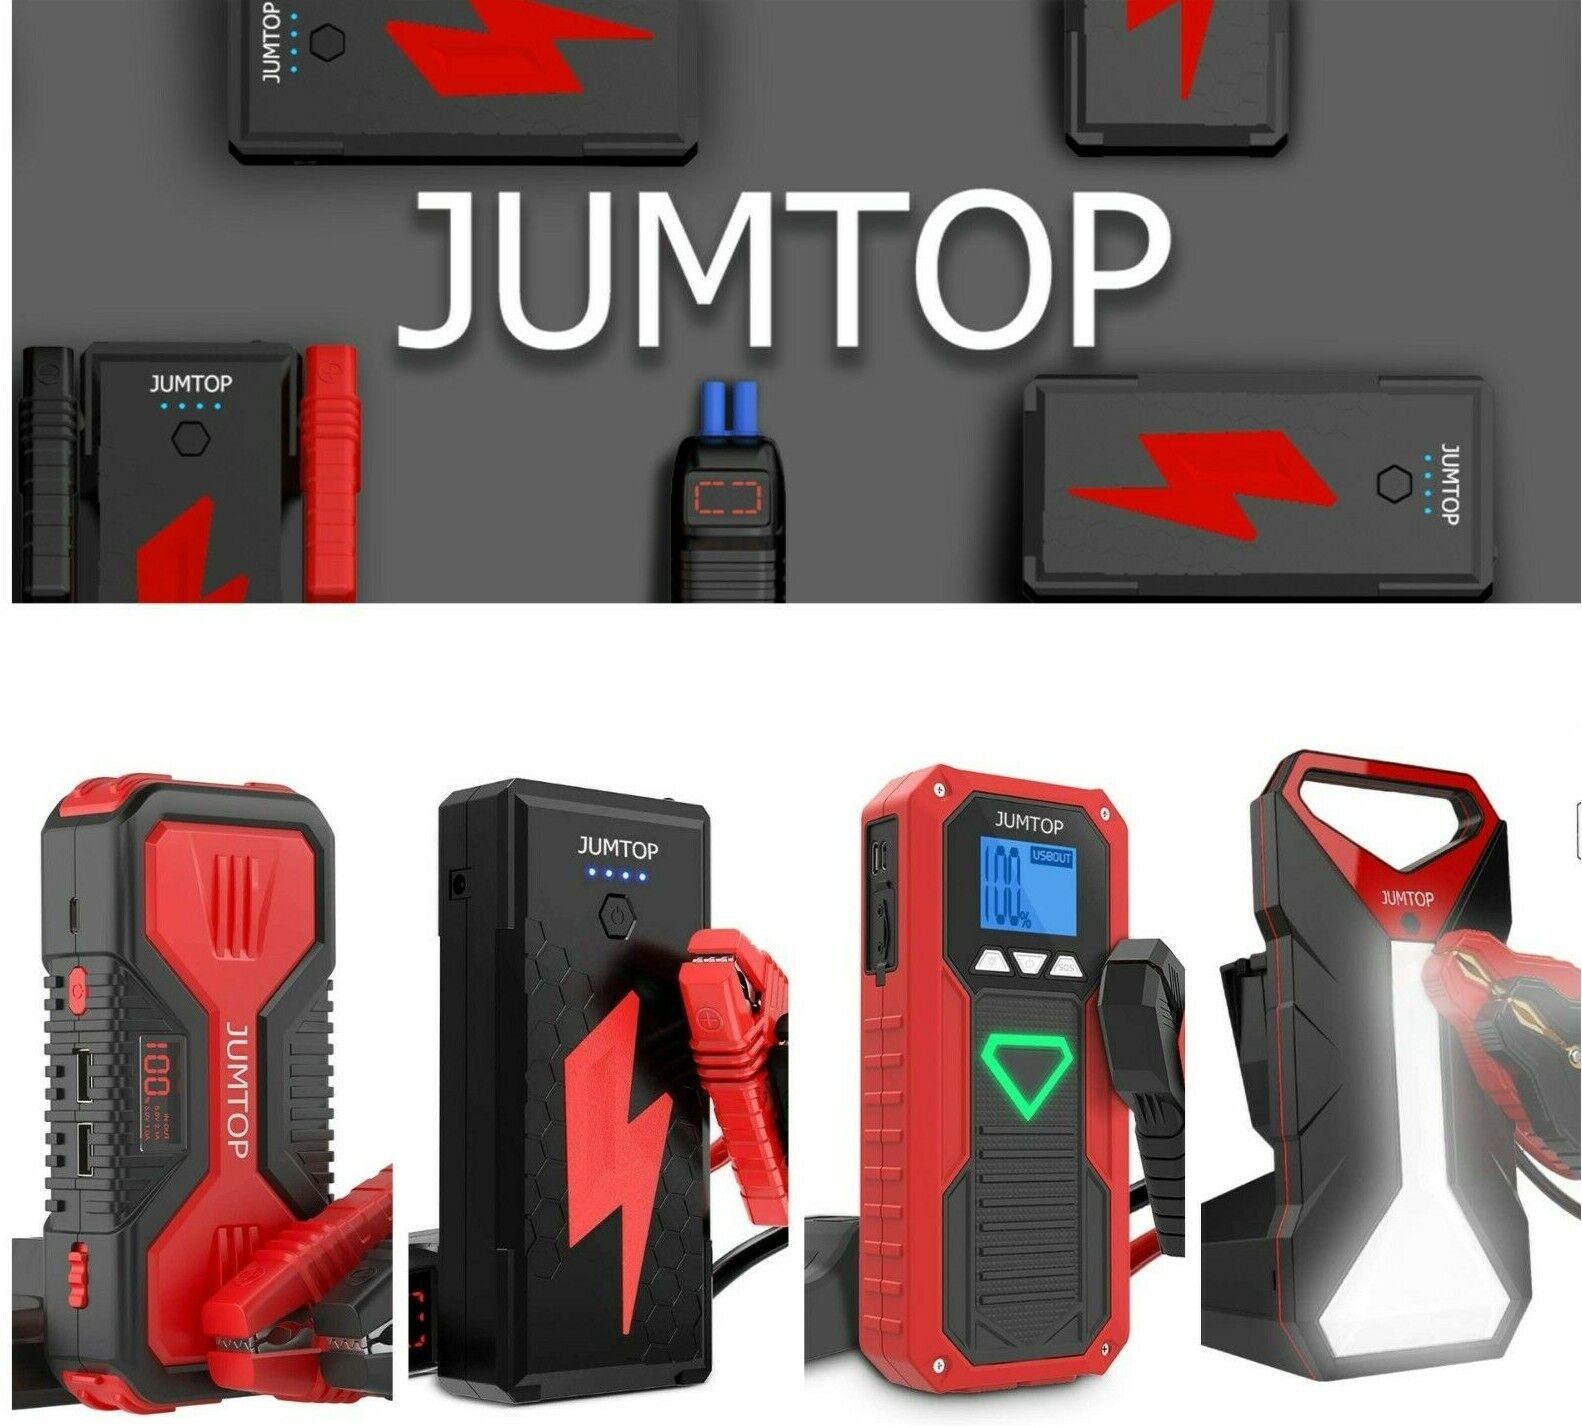 ⚡️ JUMTOP 4000A-1200A Peak Portable Car Jump Starter Battery Booster SEALED ✨